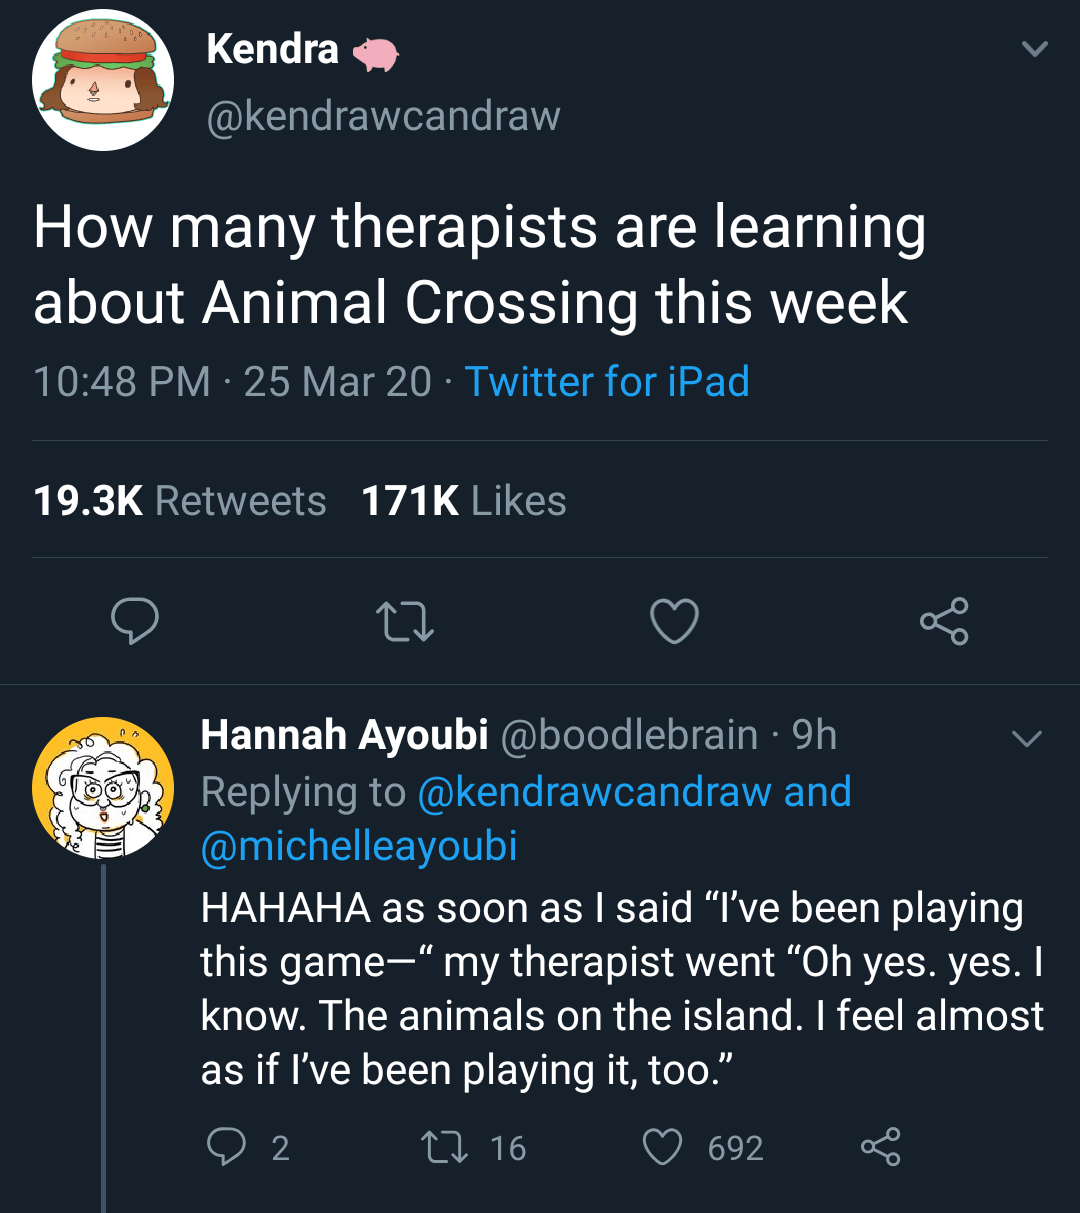 funny animal crossing island memes - therapists